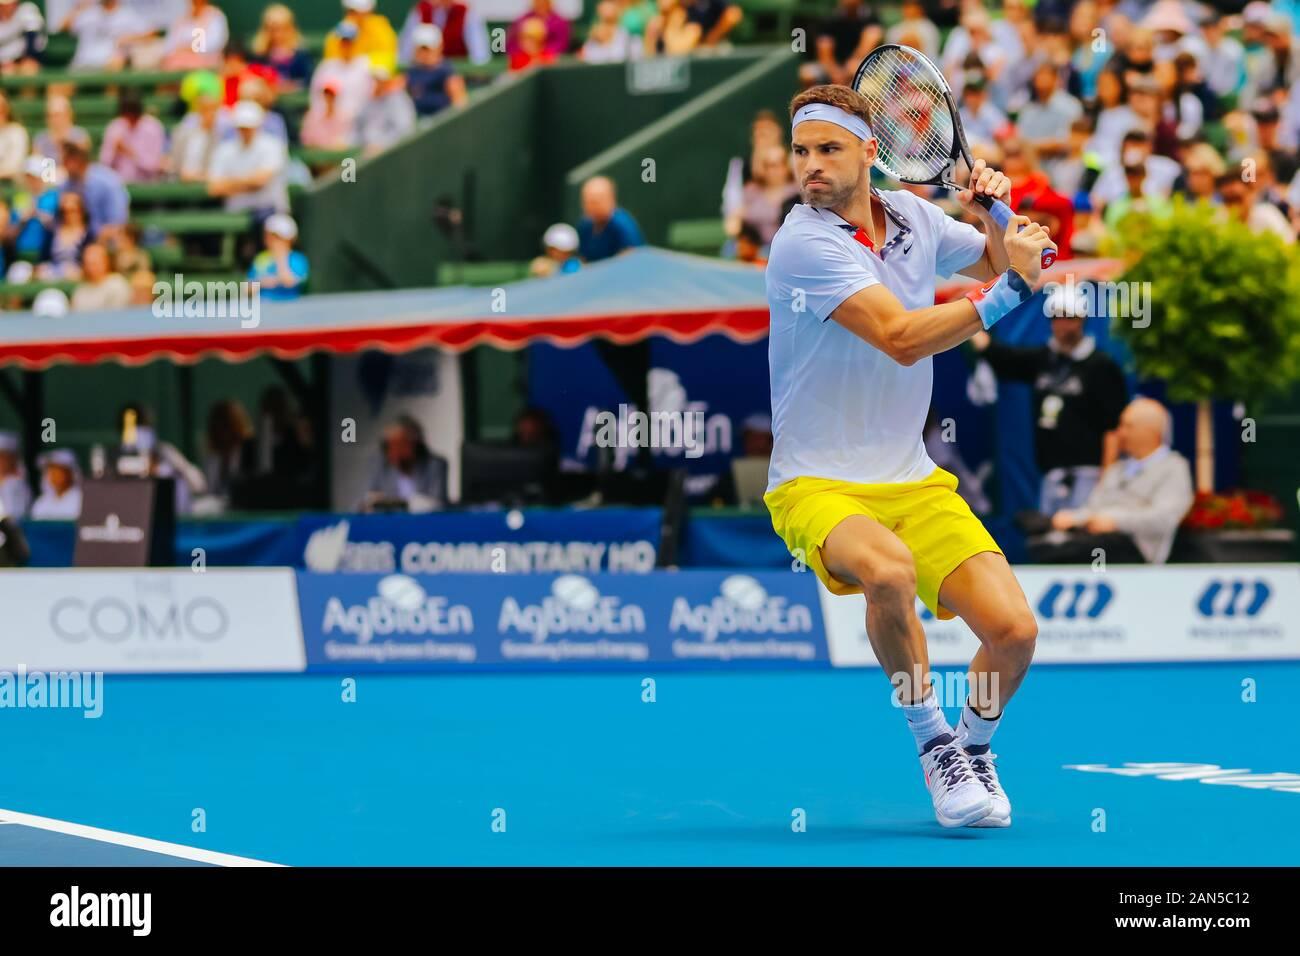 3 billes rrp £ 90 Force Triple Prince puissance TI tennis racket